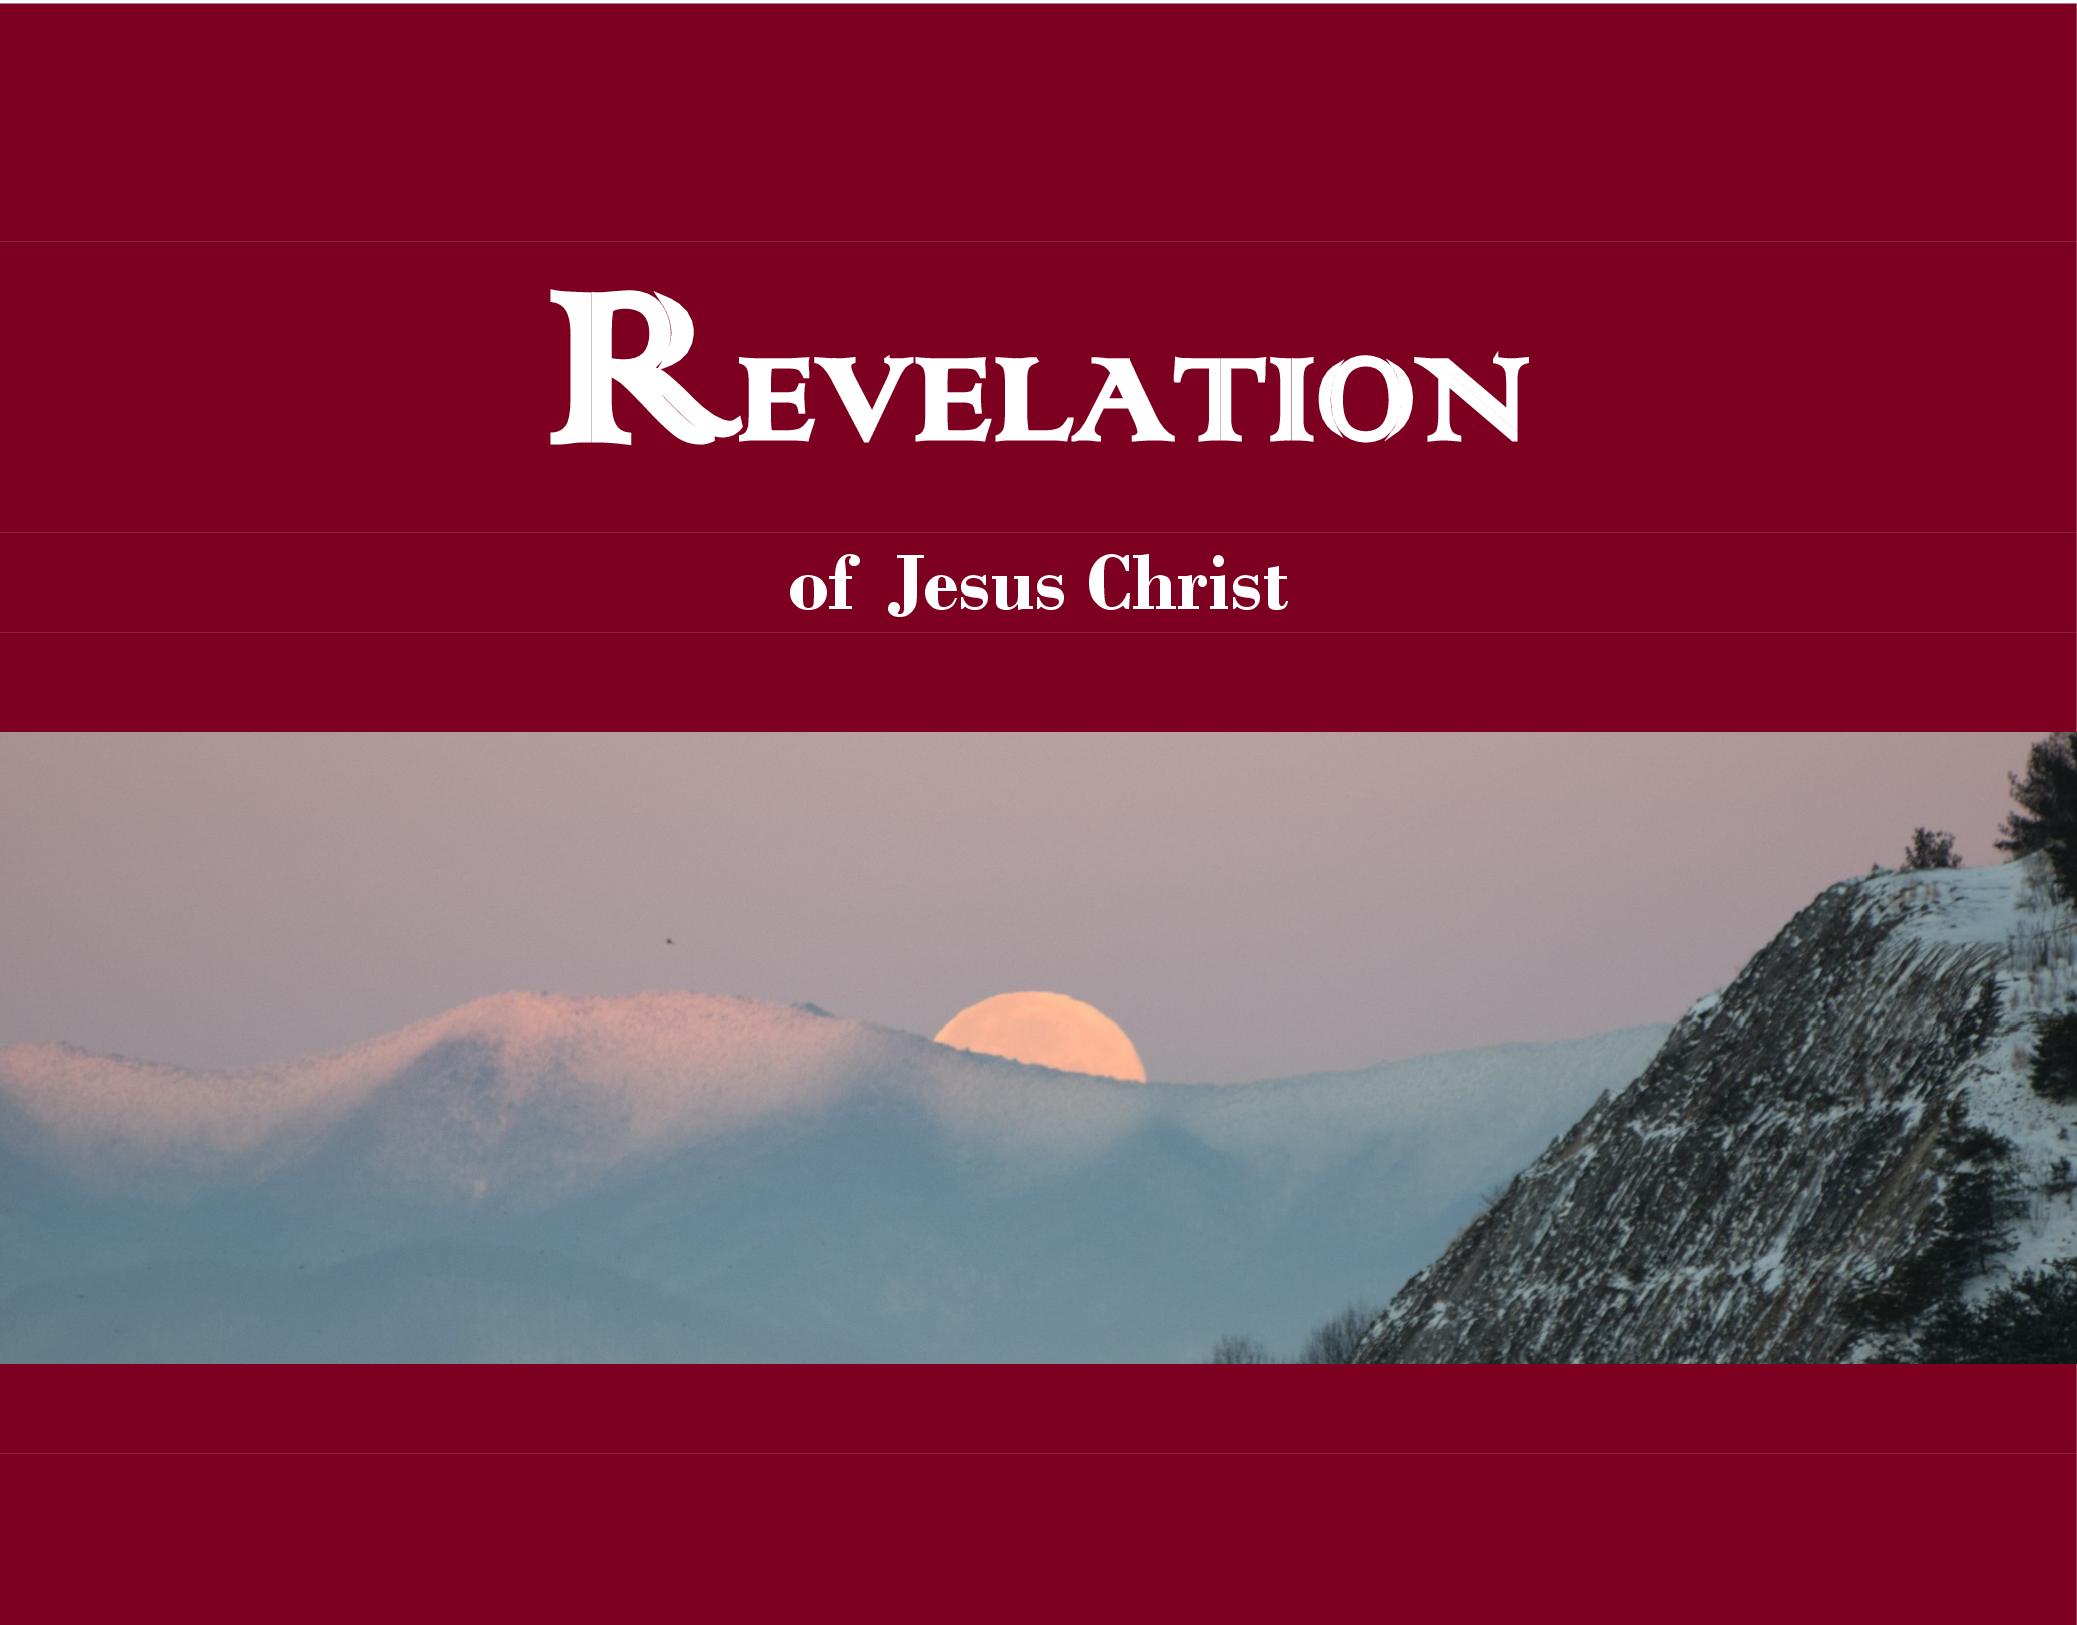 End Times Bible Study - January 23, 2019